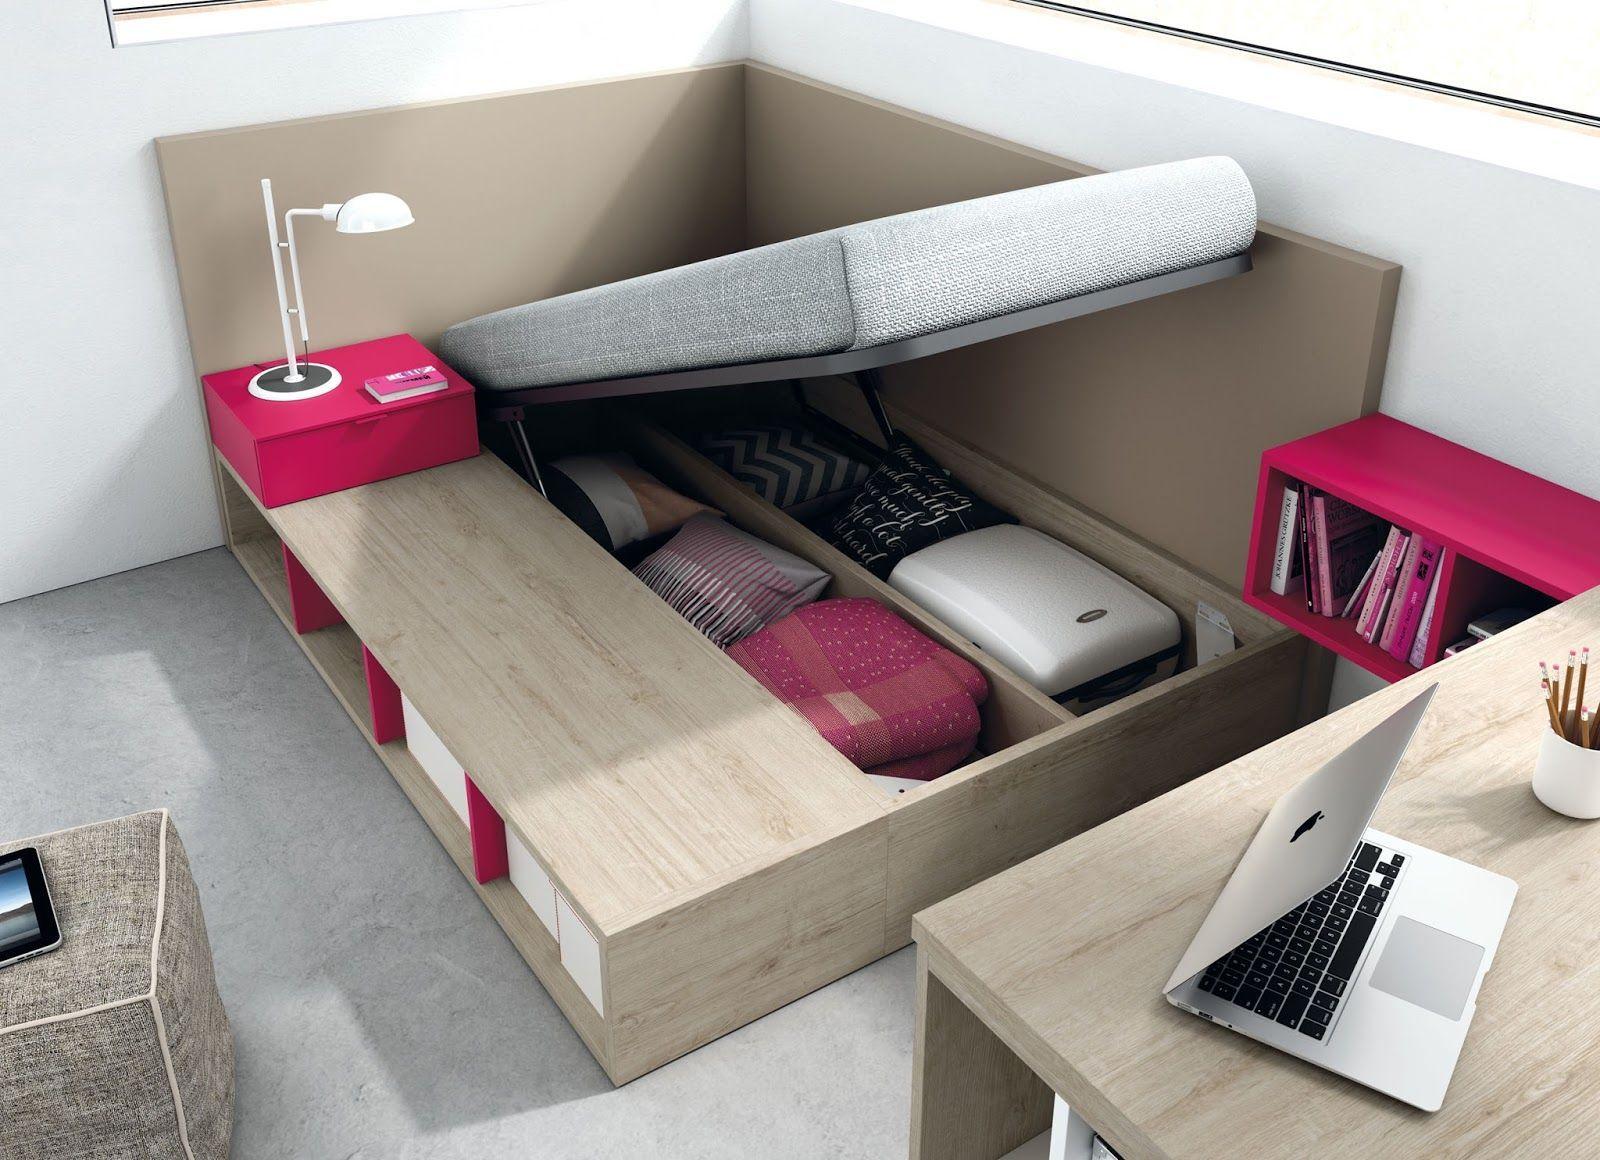 Dormitorios Juveniles E Infantiles Tegar Mobel U A Pinterest  # Muebles Tegarmobel